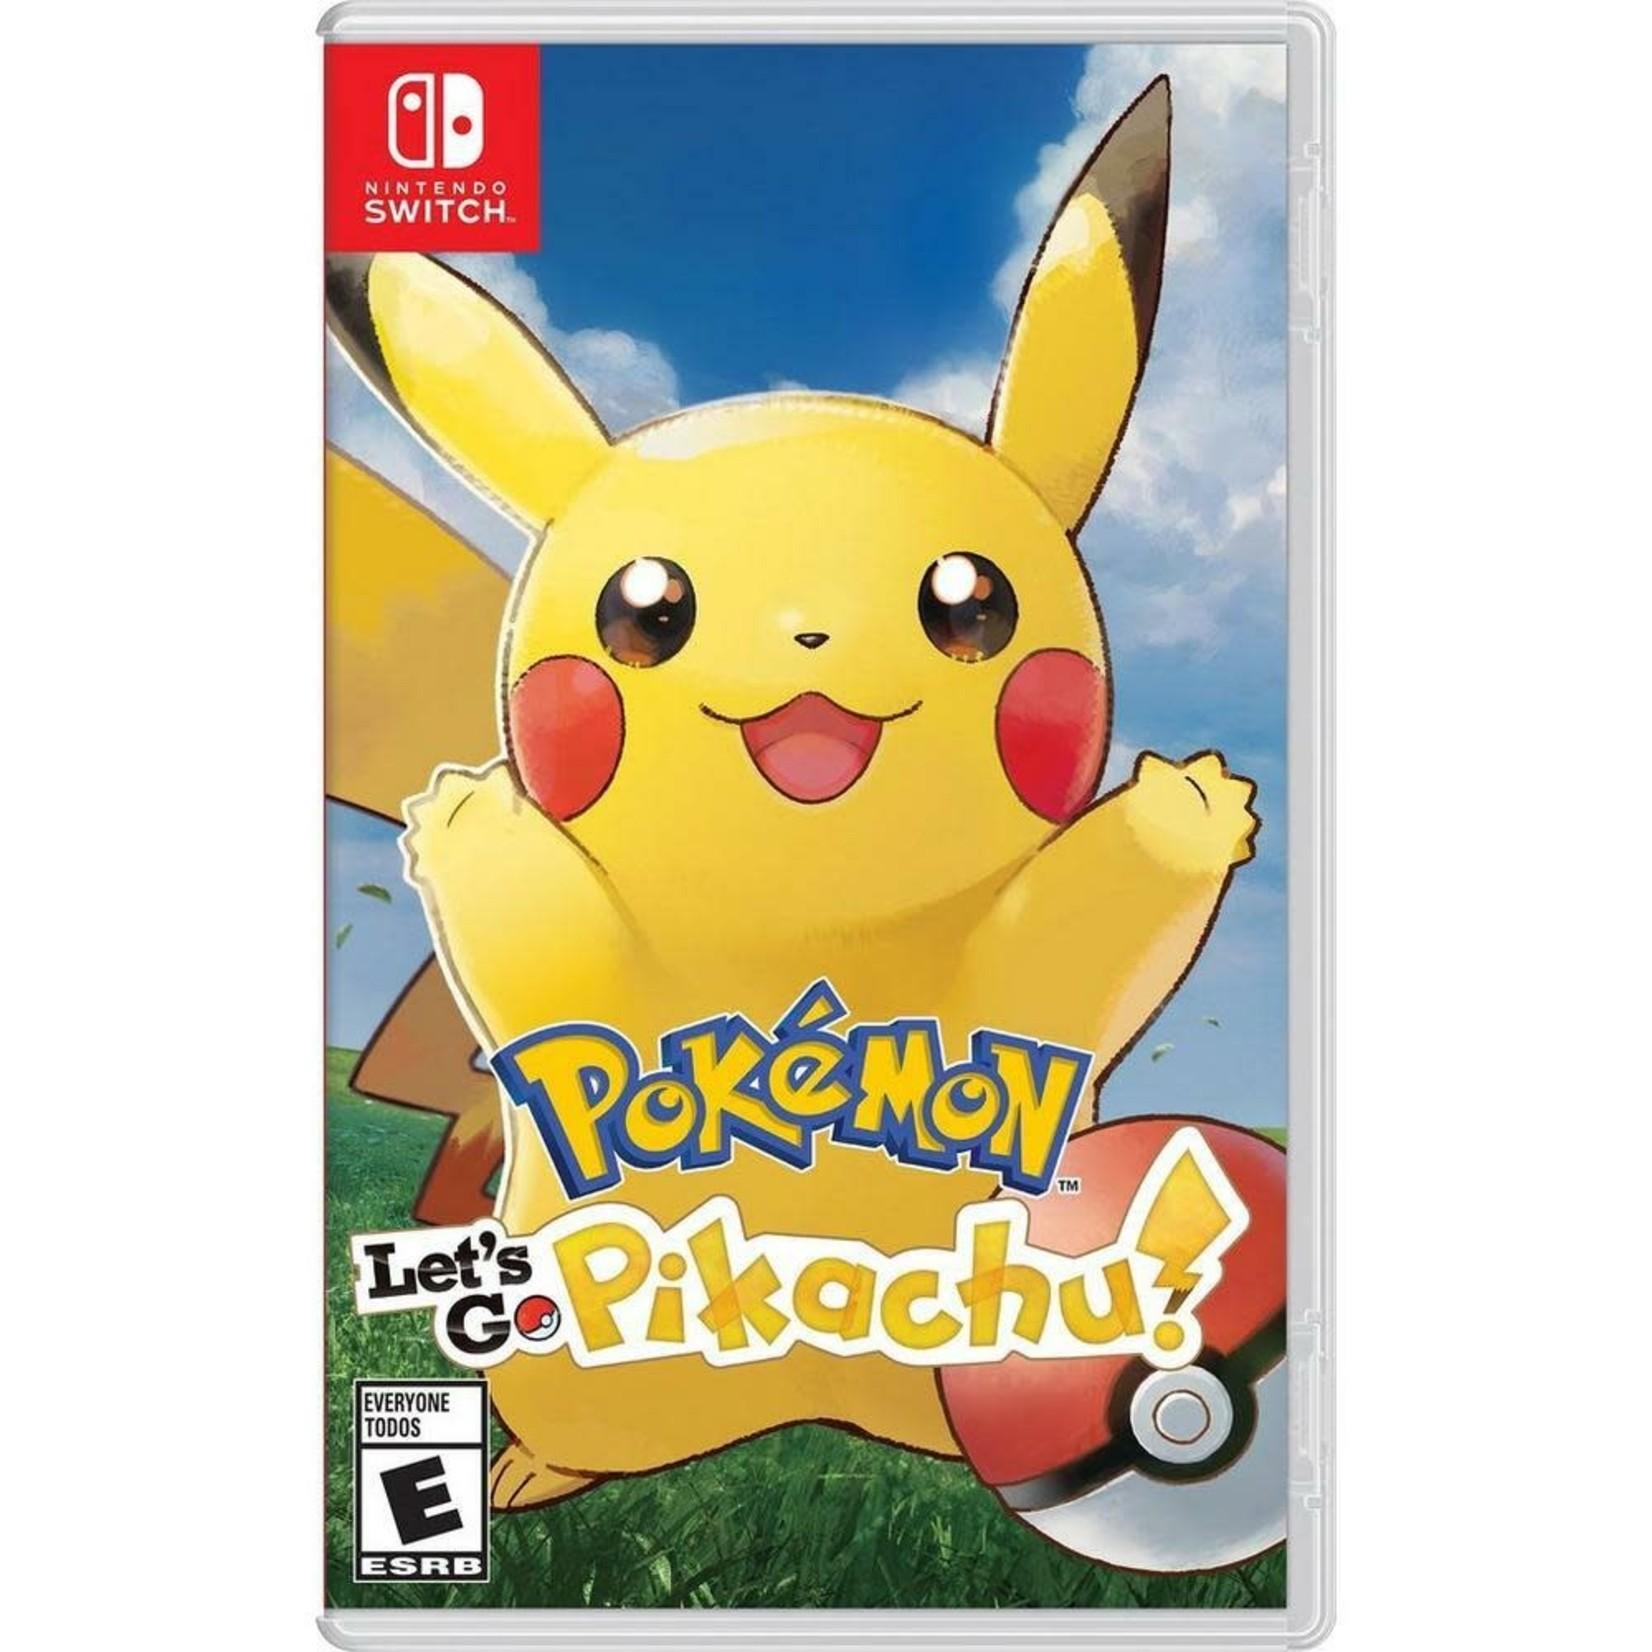 SWITCHU-Pokemon: Let's Go, Pikachu!